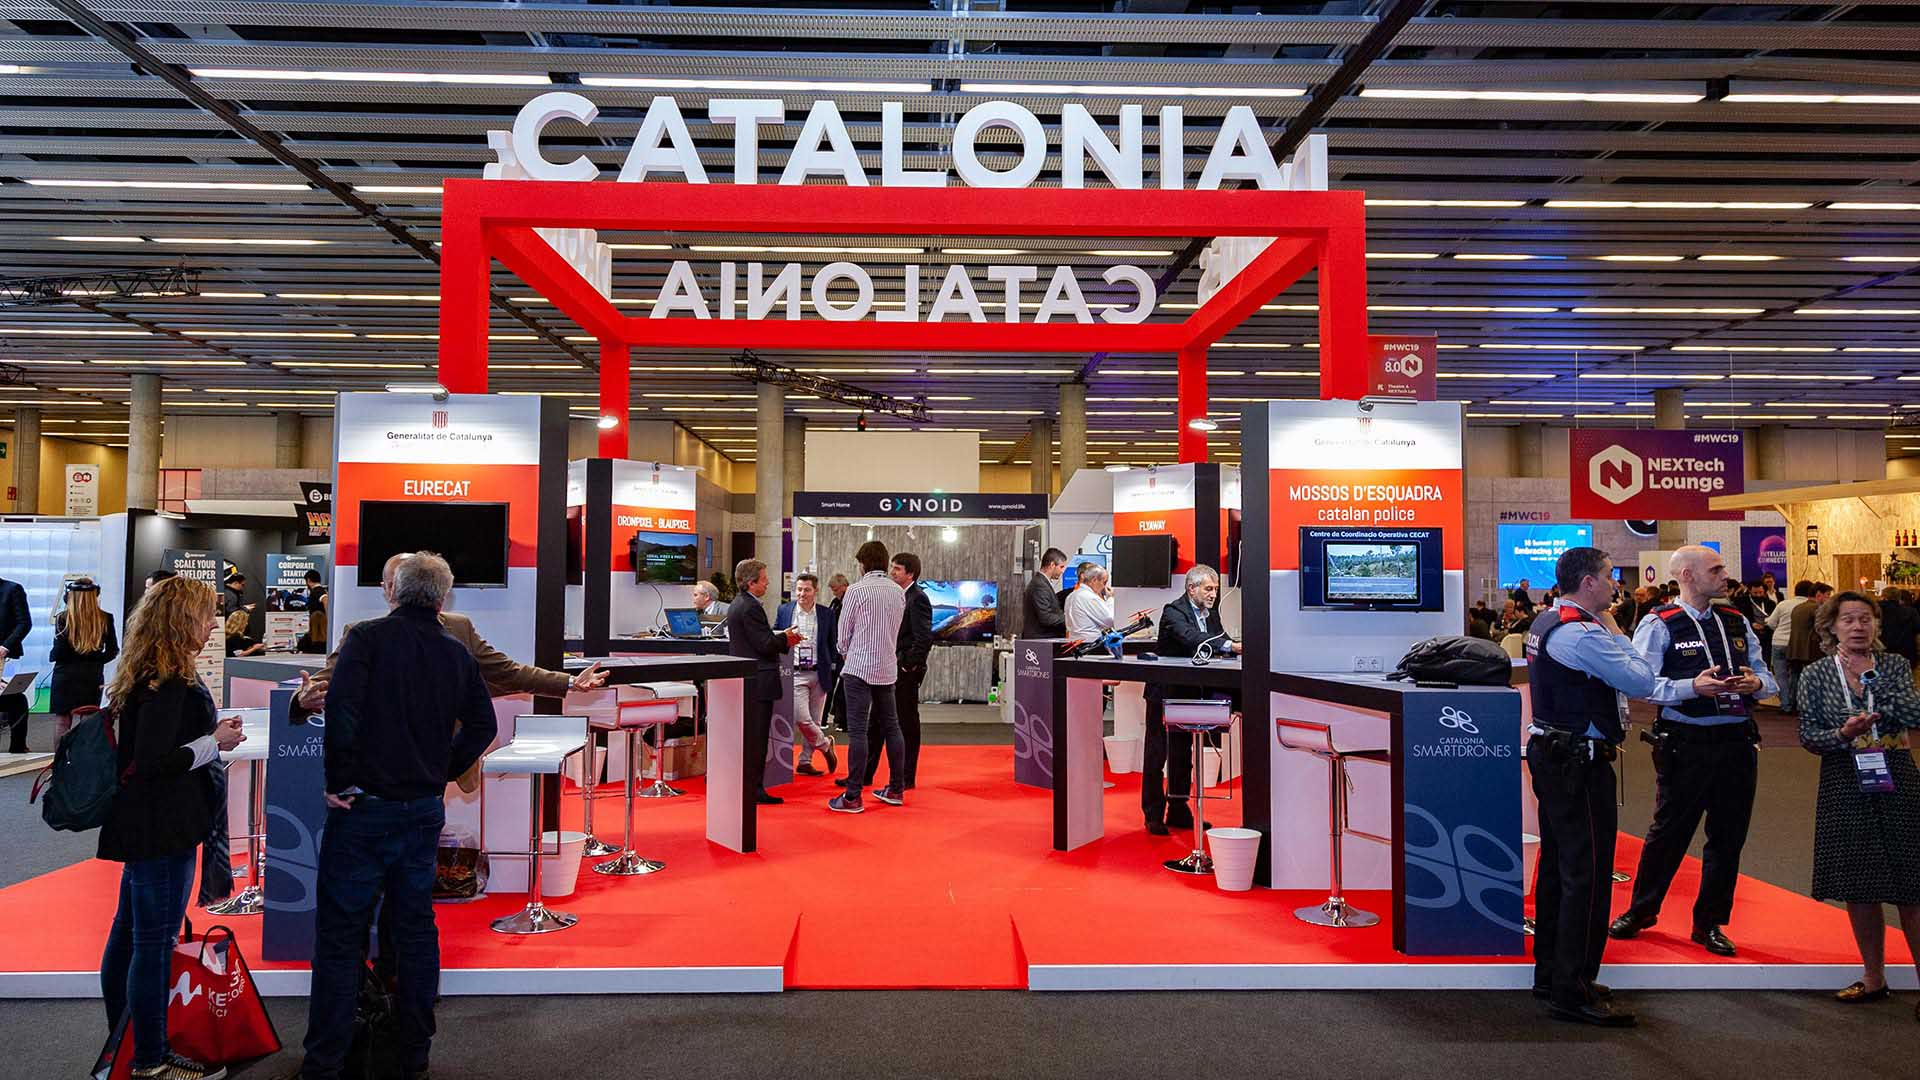 Mobile world congress. Diseño stand catalonia